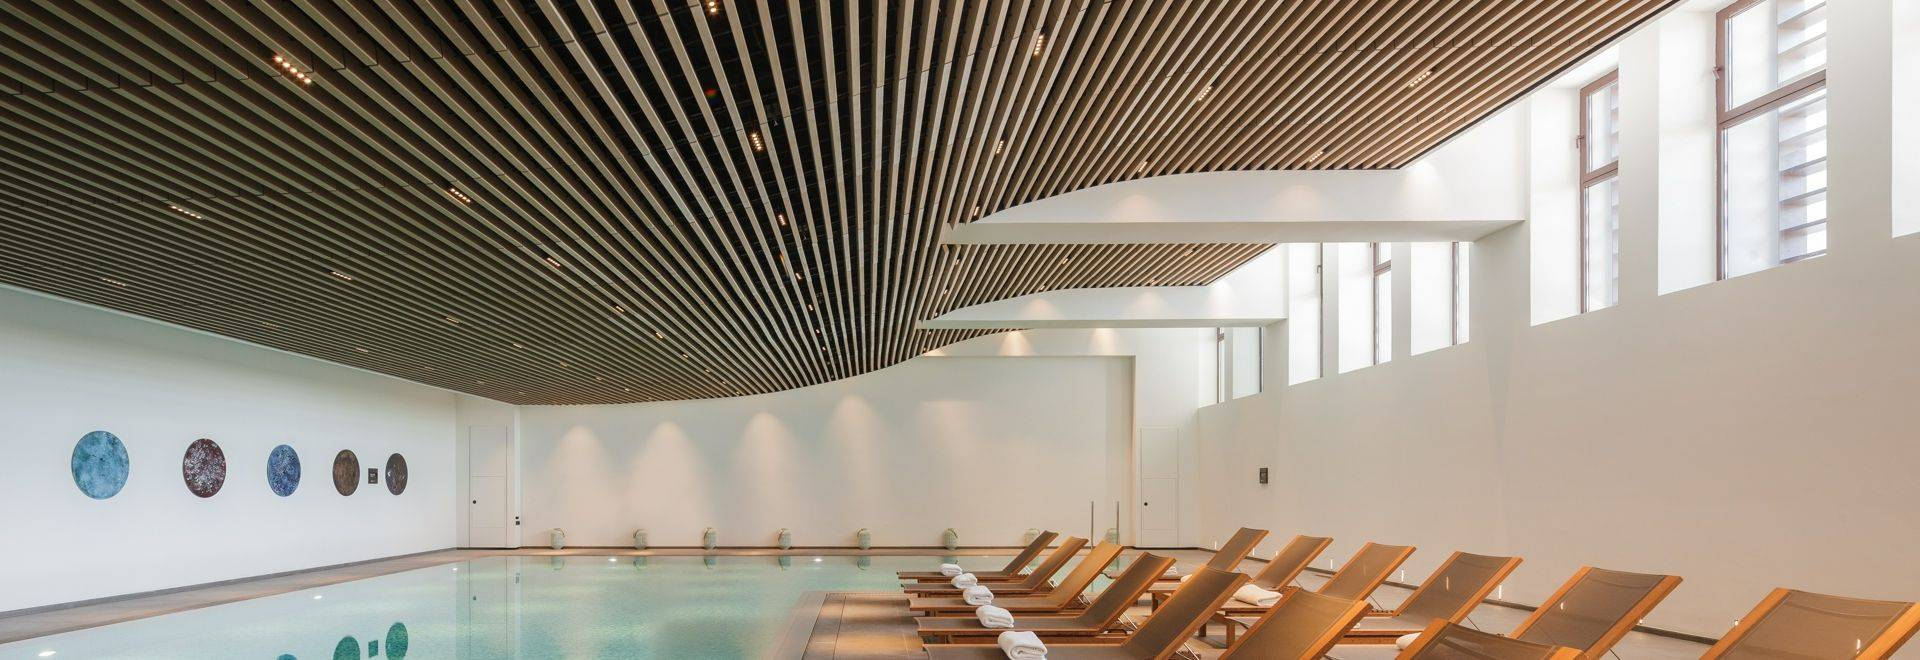 Six-Sense-Kaplankaya-indoor-pool.jpeg